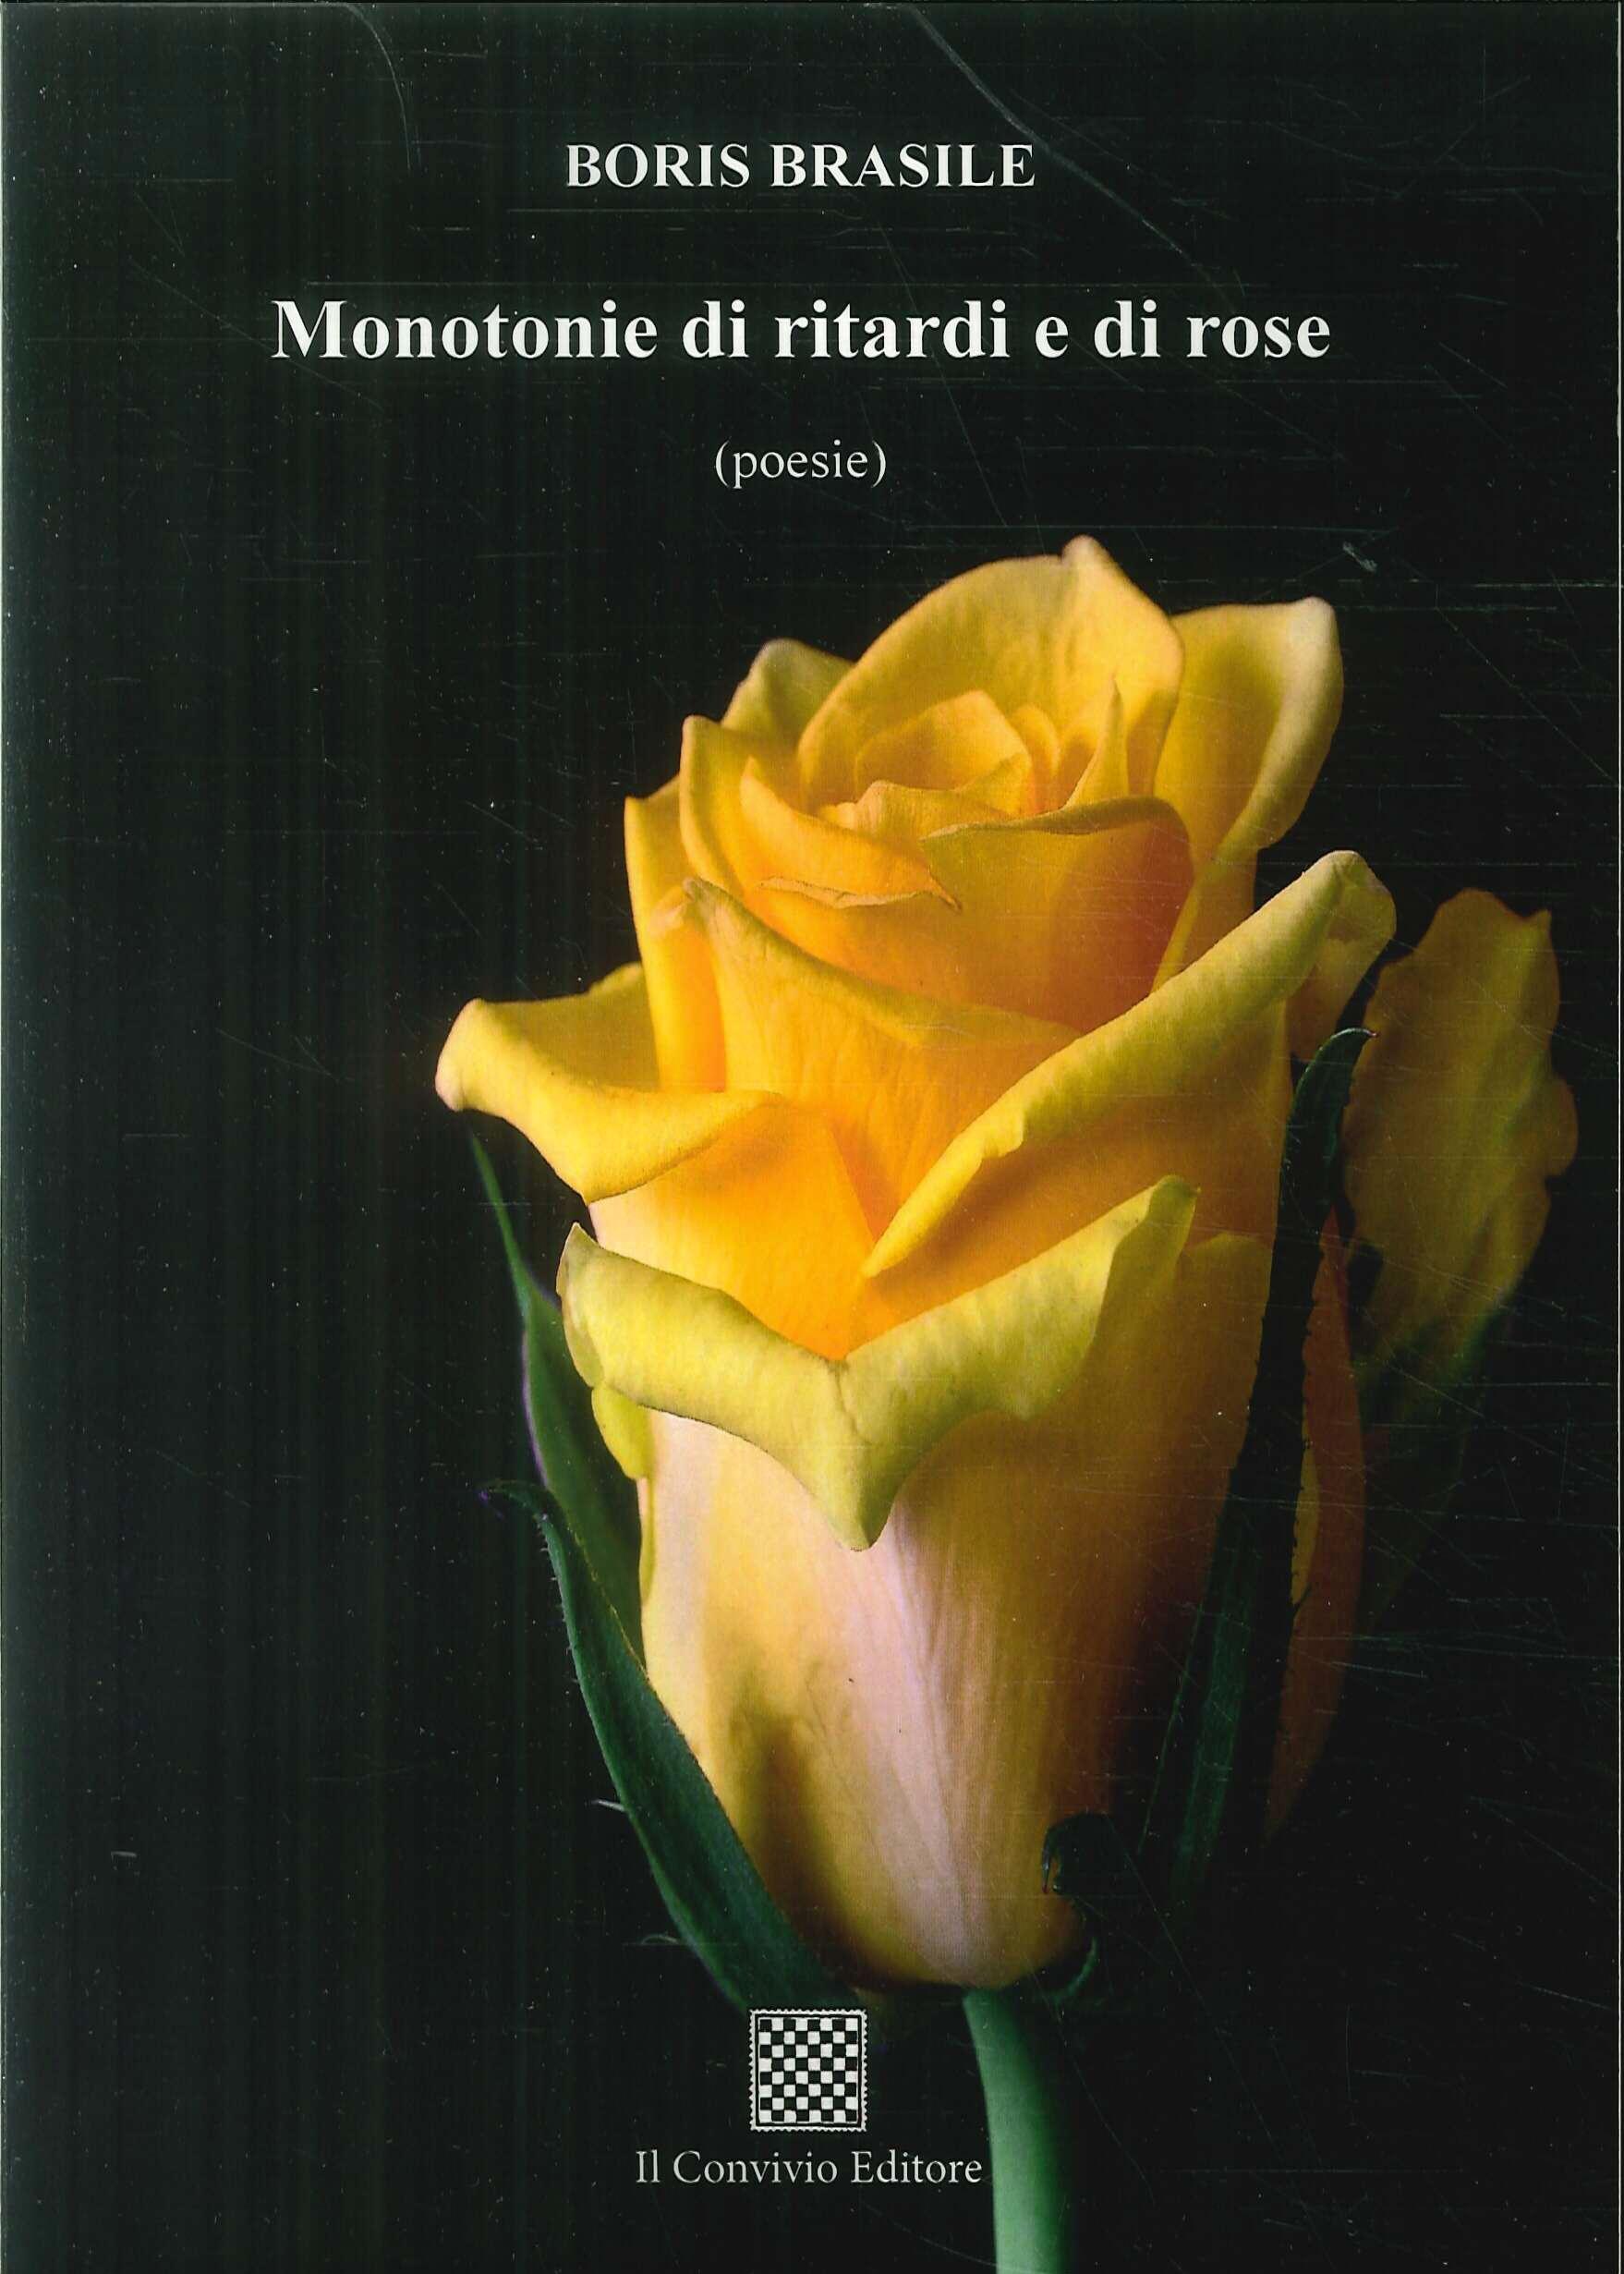 Monotonie di ritardi e di rose (poesie)